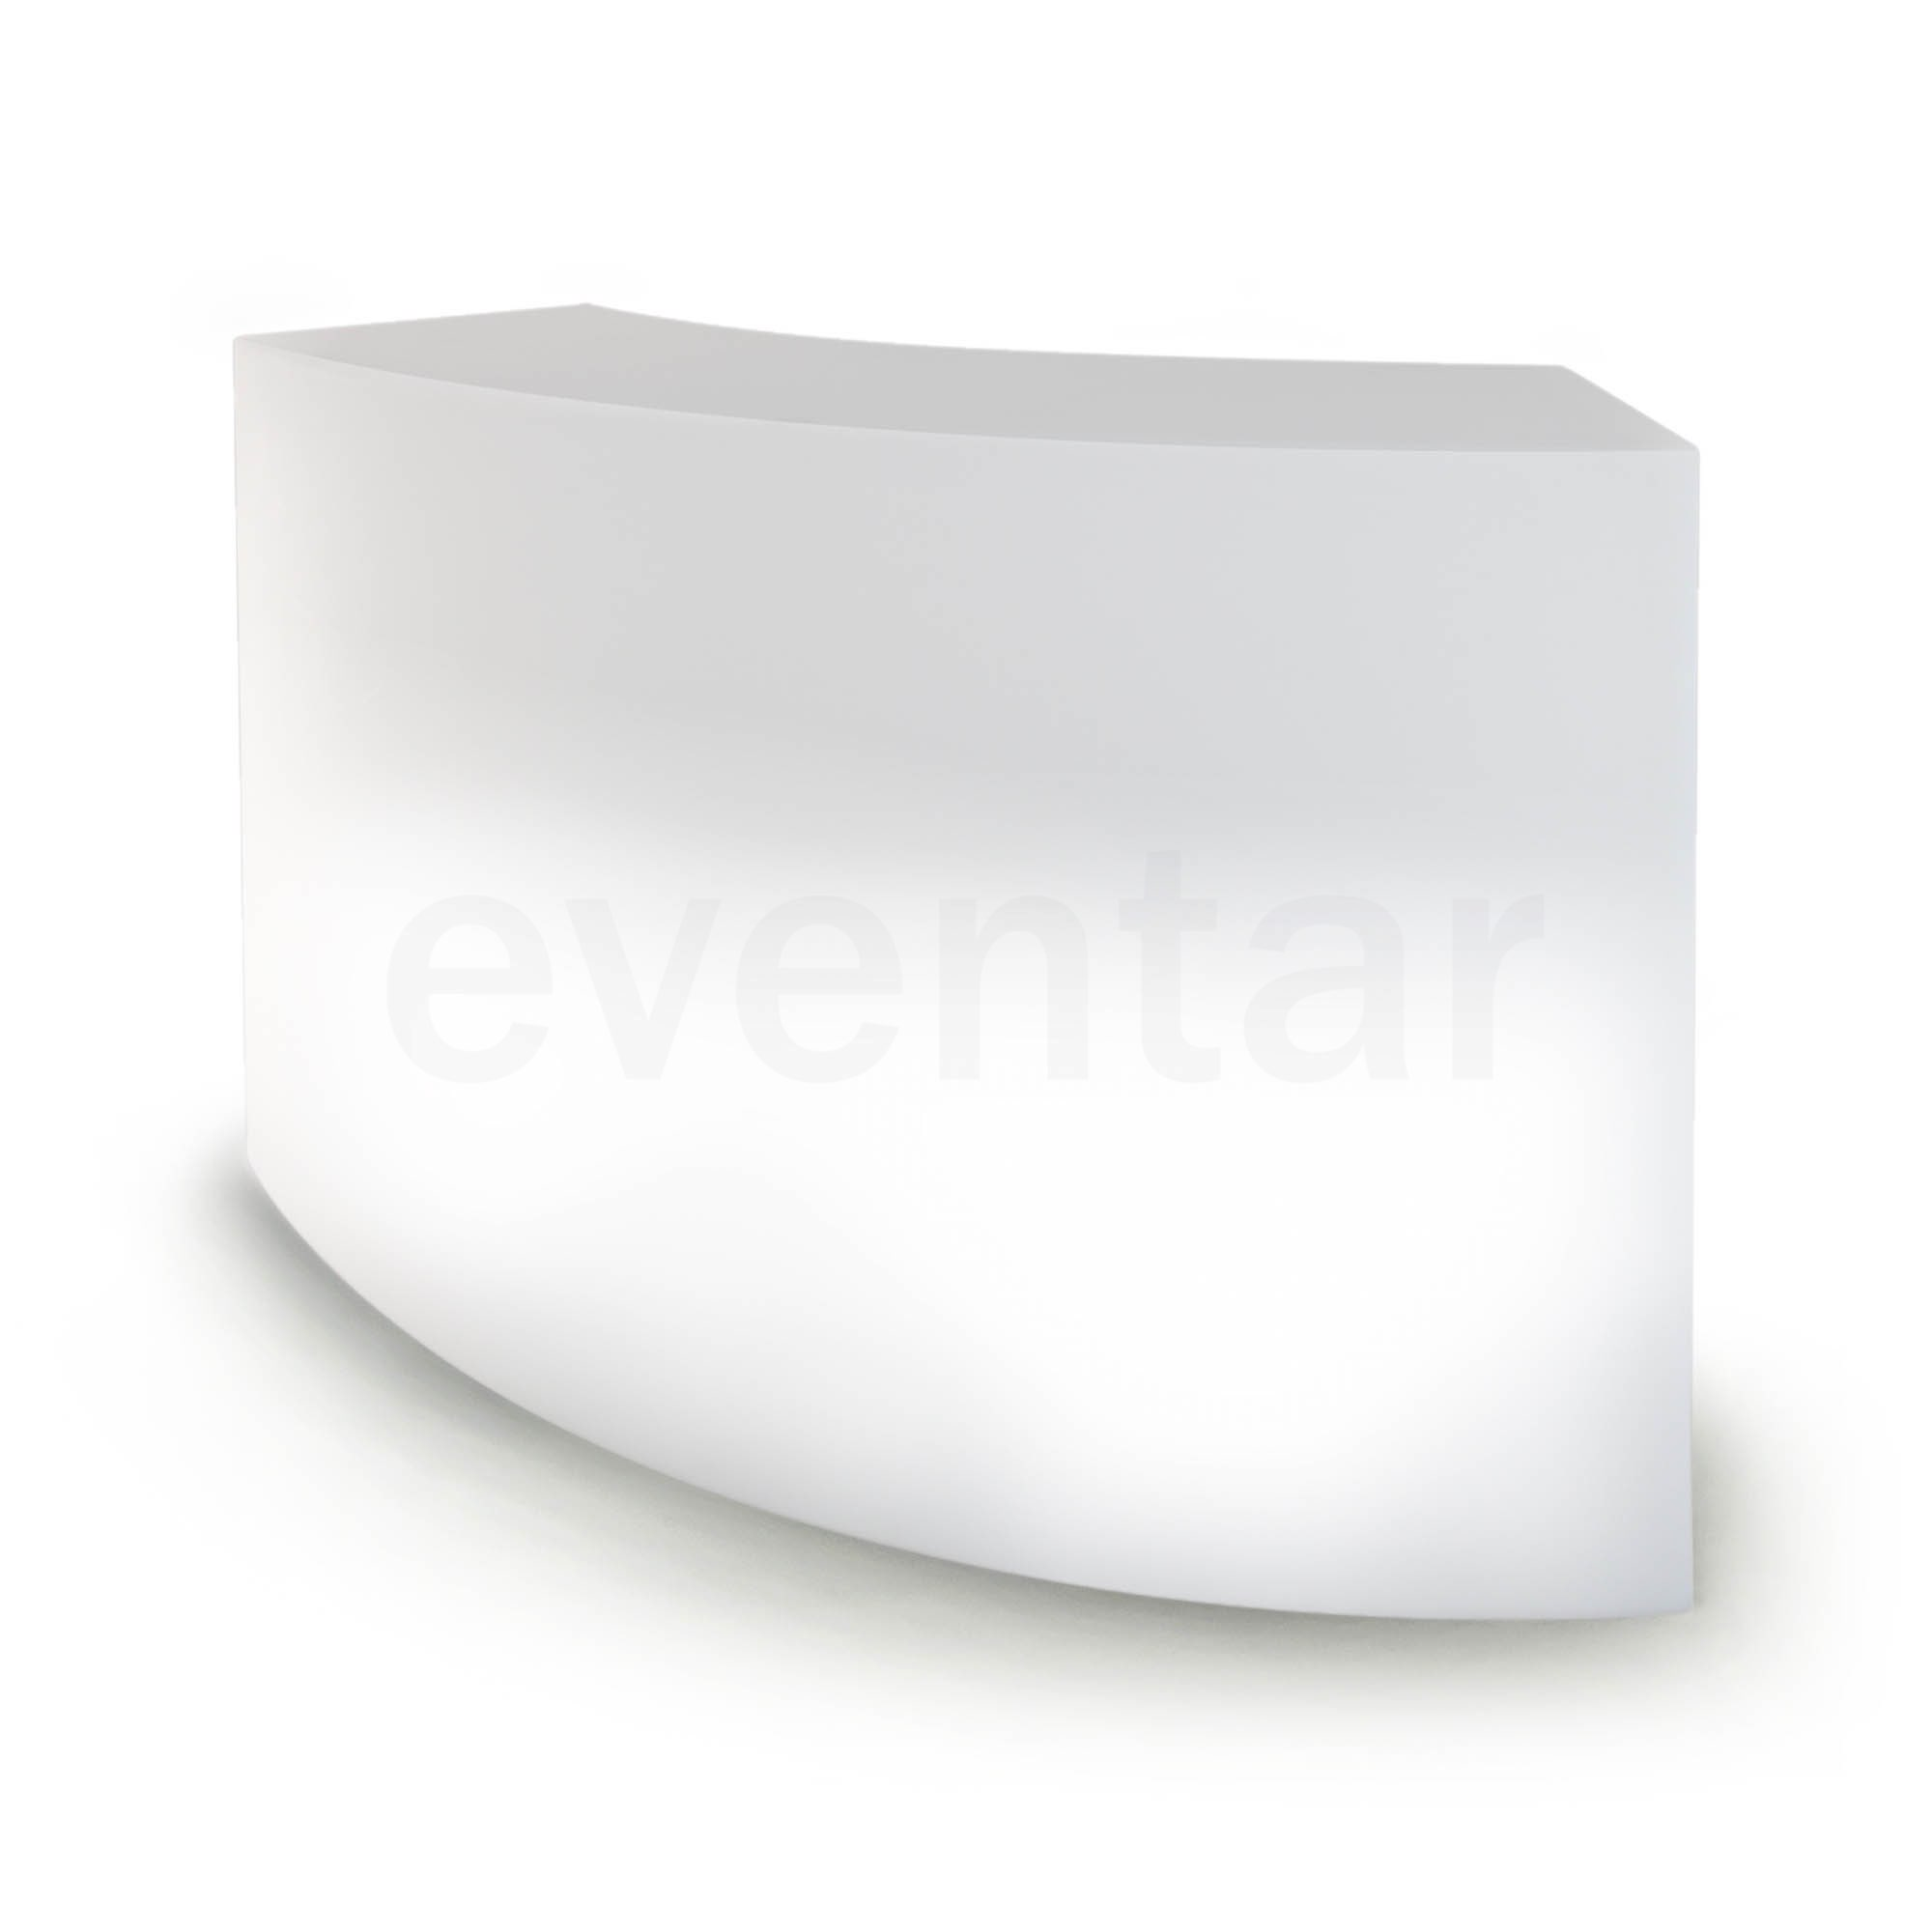 SNACK BAR - Bar Theke   Eventar Shop für Eventmöbel & Medientechnik